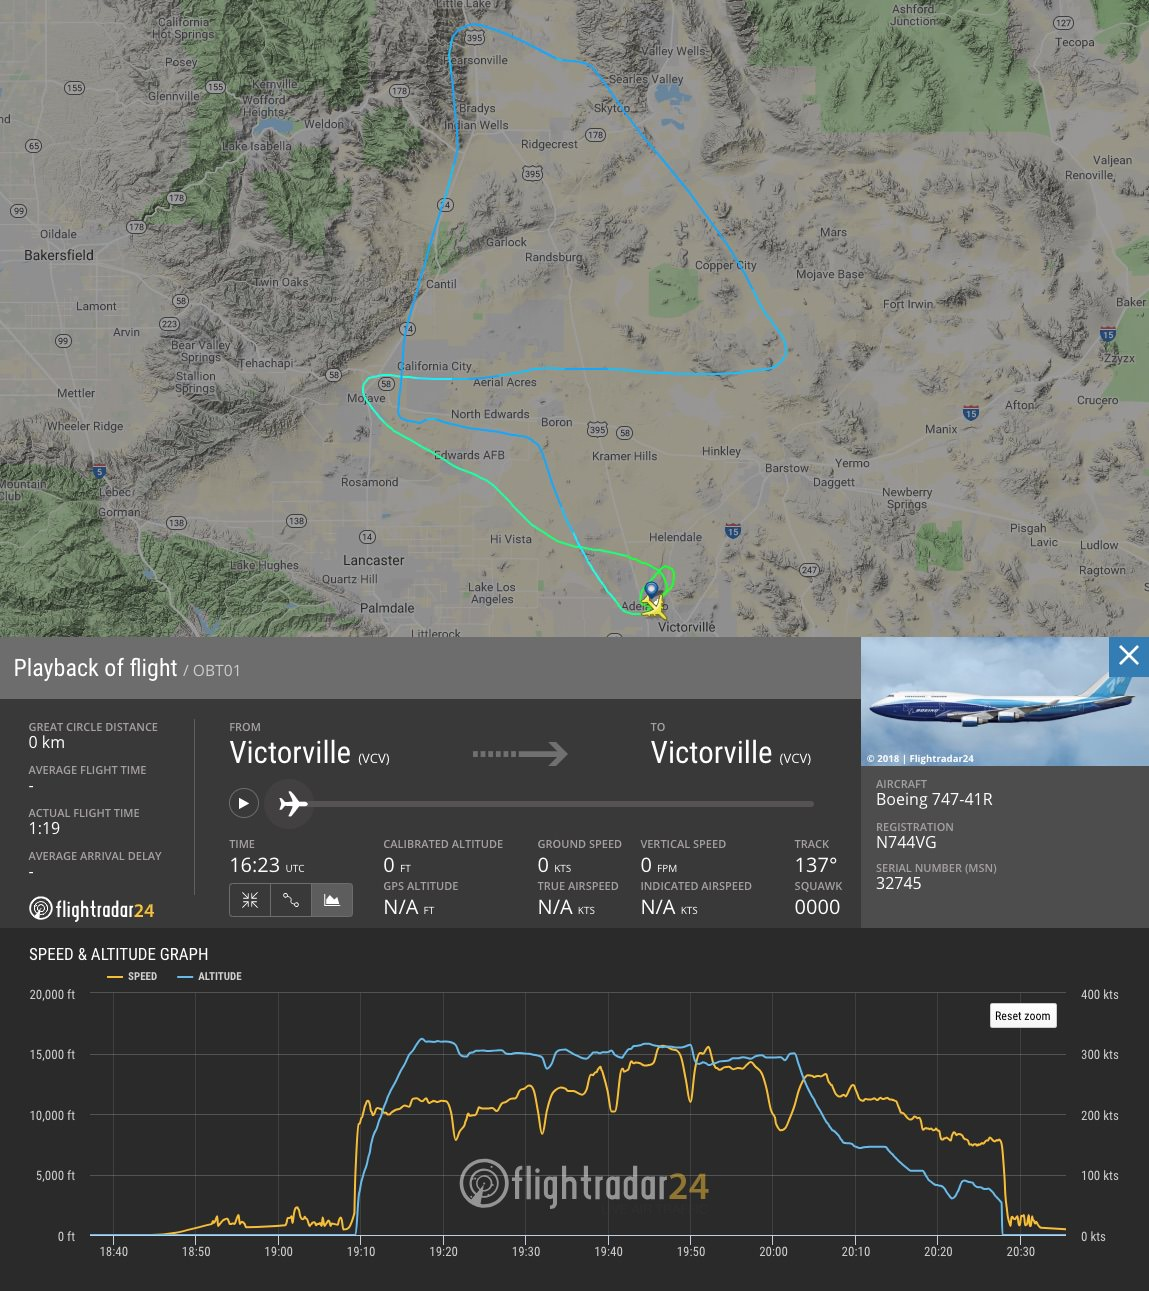 Virgin Orbit Captive Carry Test Flight of Launcher One